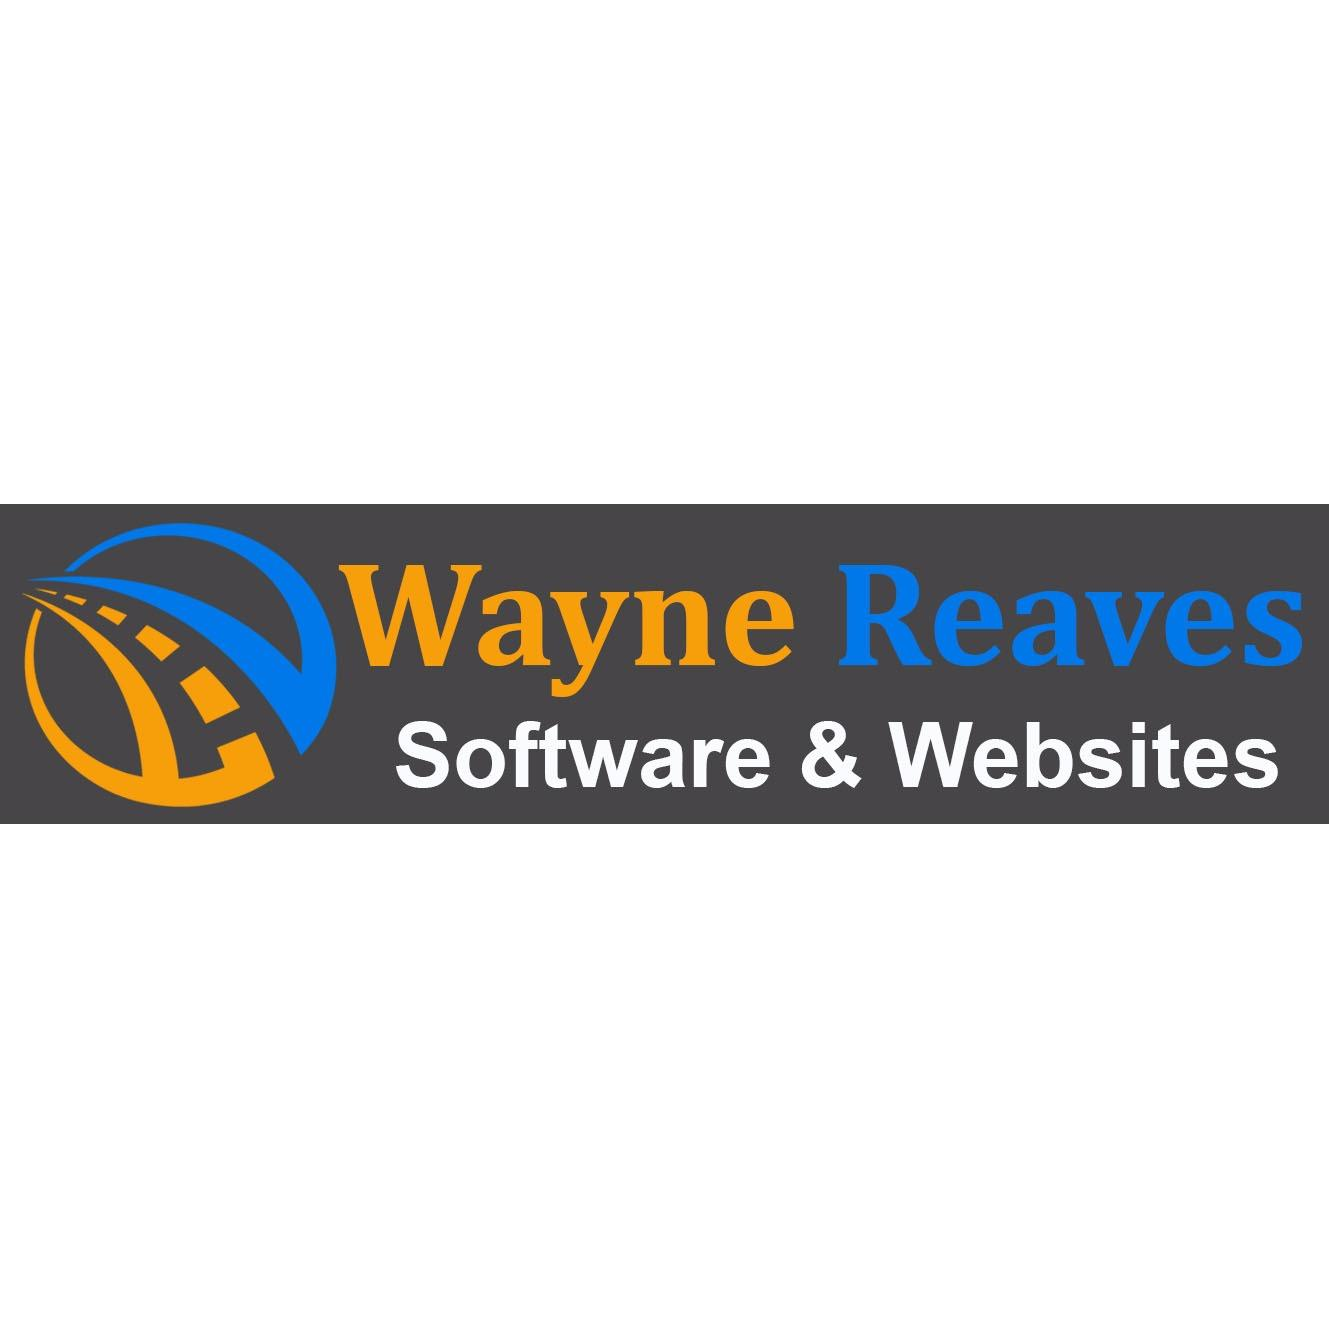 Wayne Reaves Software - Macon, GA - Computer Consulting Services